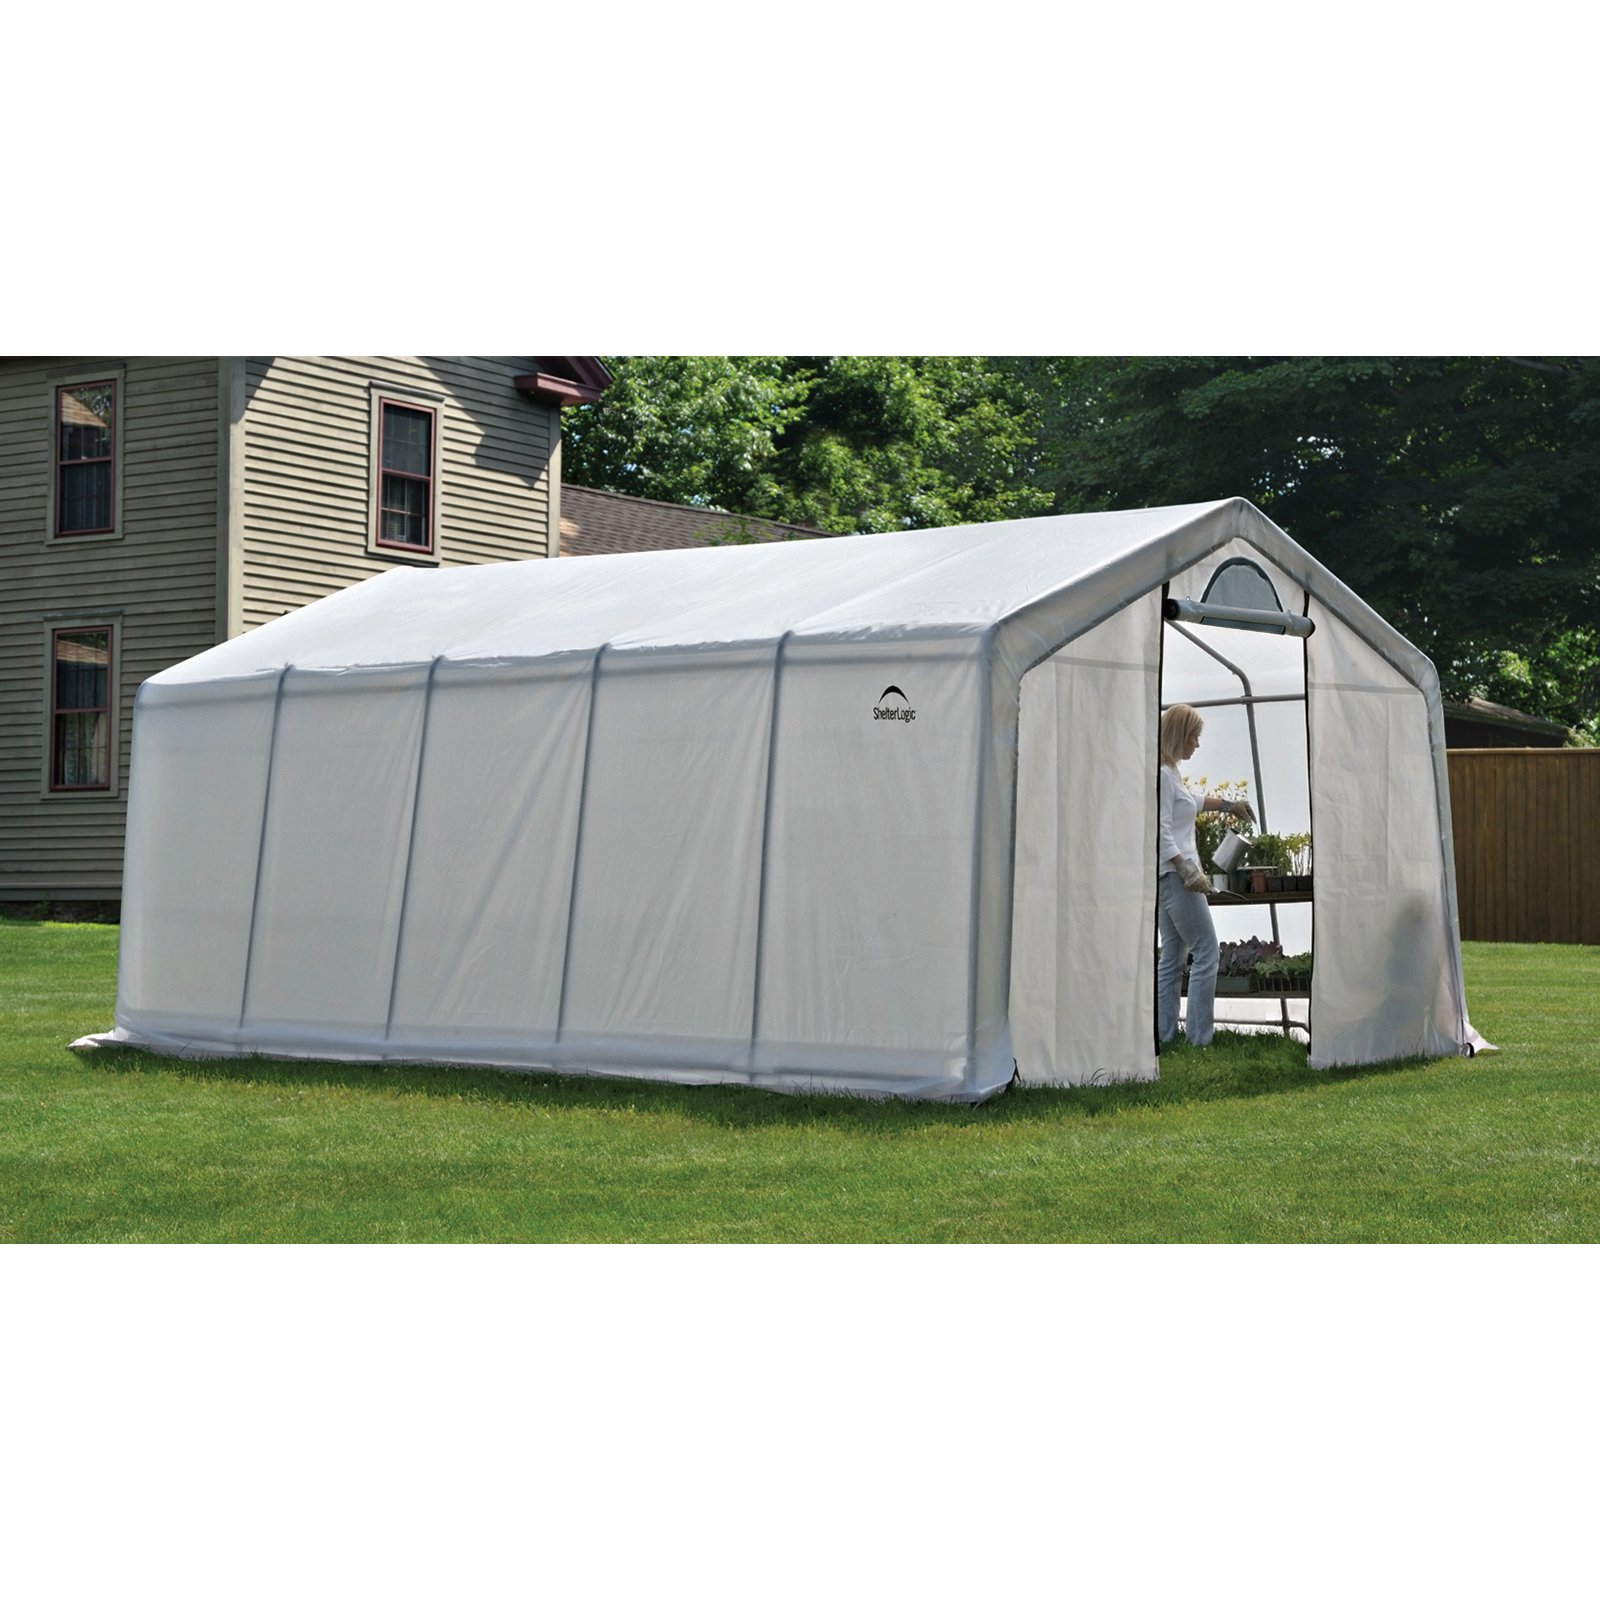 GrowIt Greenhouse-In-A-Box Pro Peak-Style, 12' x 20' x 8'